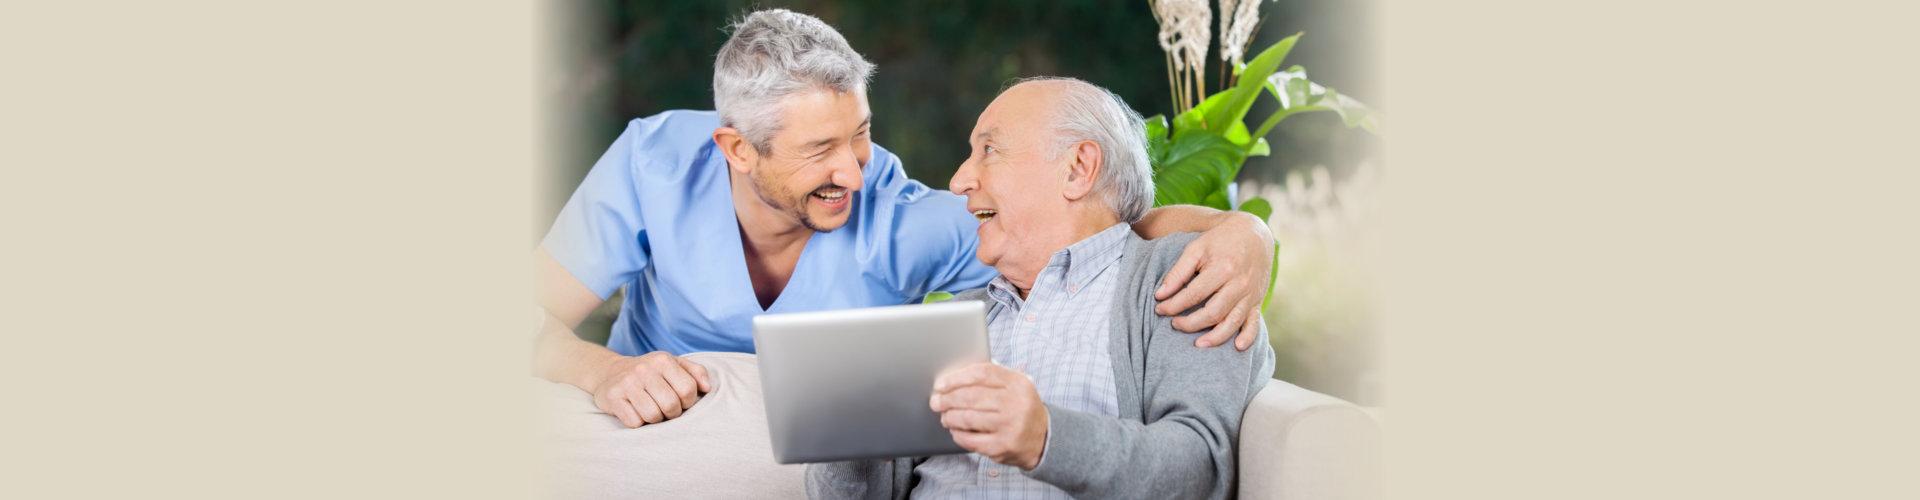 Laughing male caretaker and senior man using tablet computer at nursing home porch